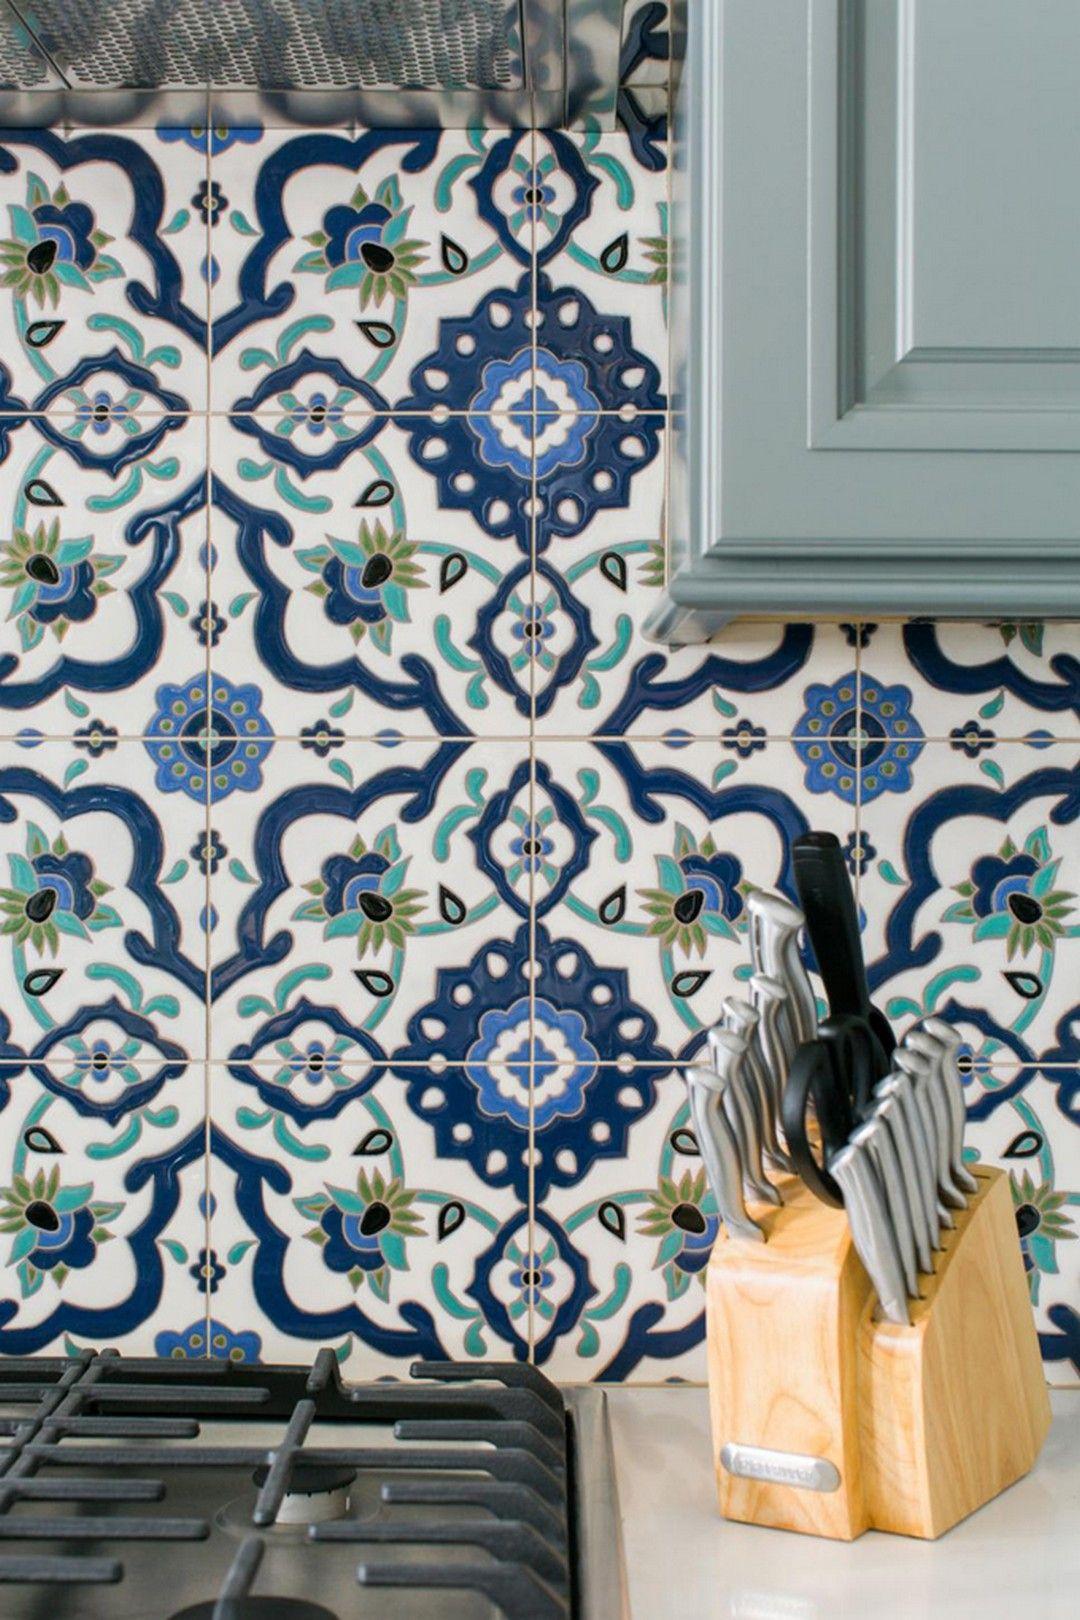 cool Spanish Tile Kitchen Decorating Ideas: 99 Gorgeous Photos http ...